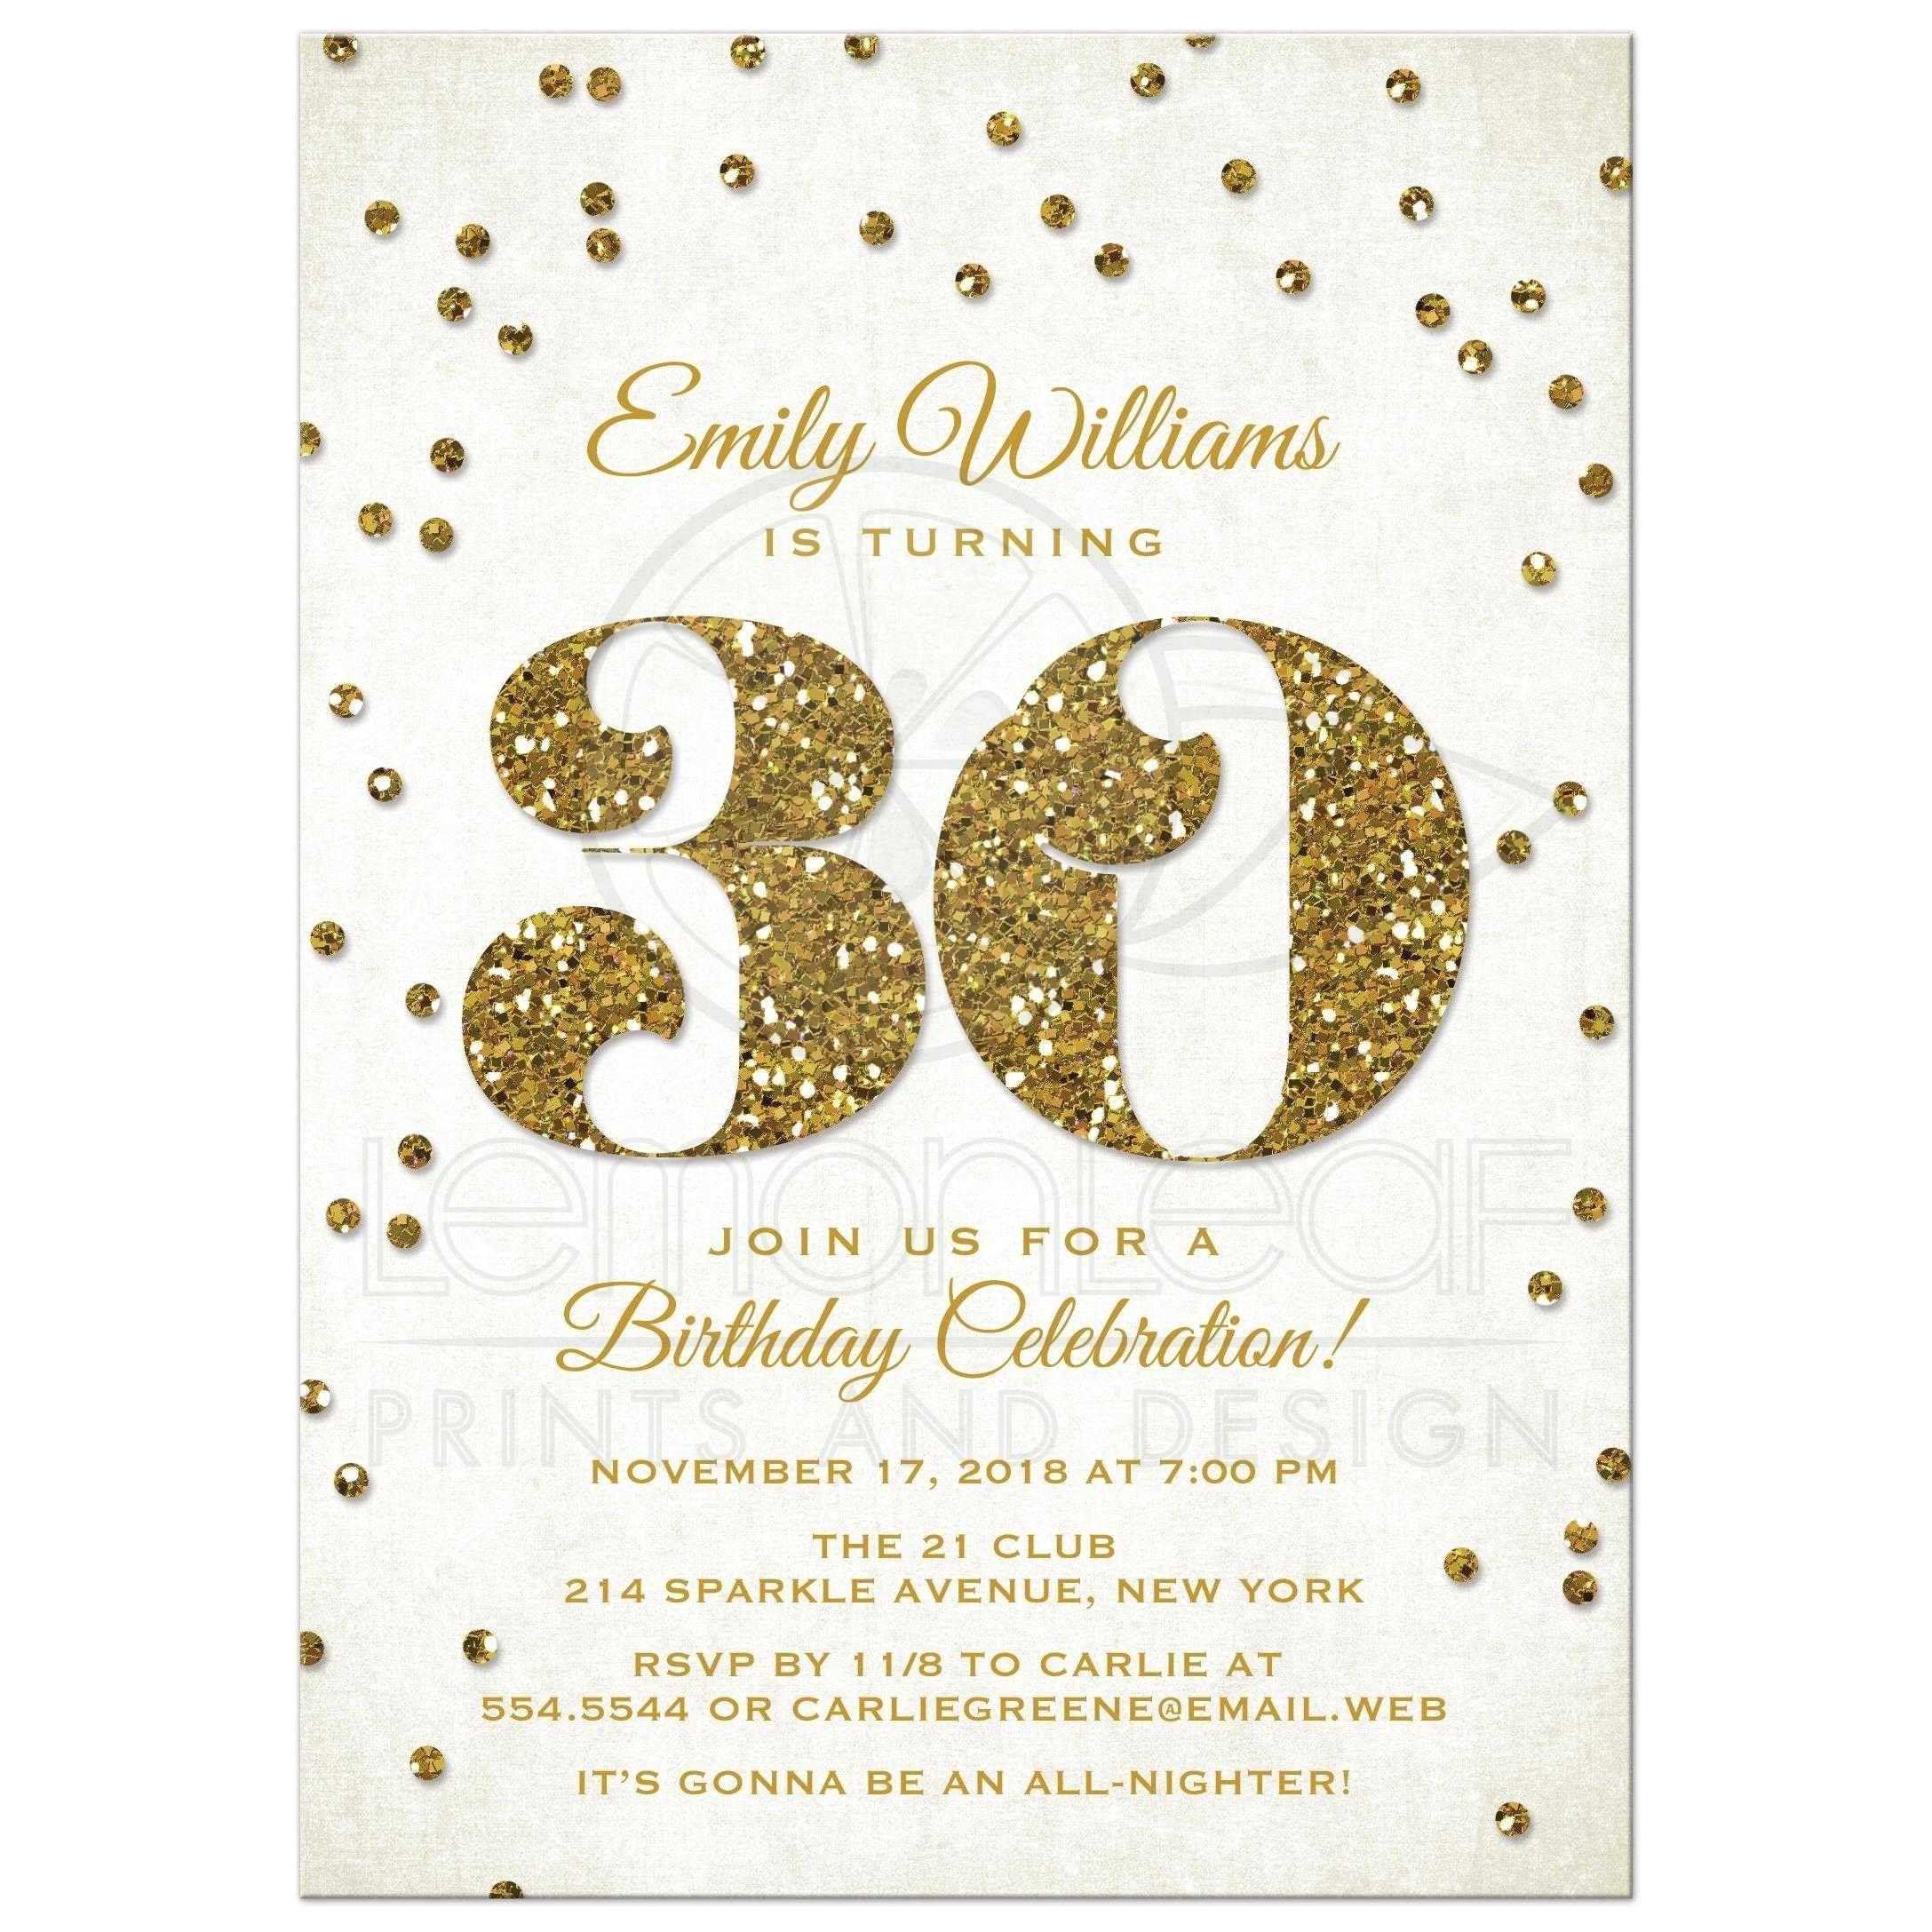 014 Template Ideas 60Th Birthday Invites Templates Wonderful 60 - Free Printable Birthday Invitations For Him